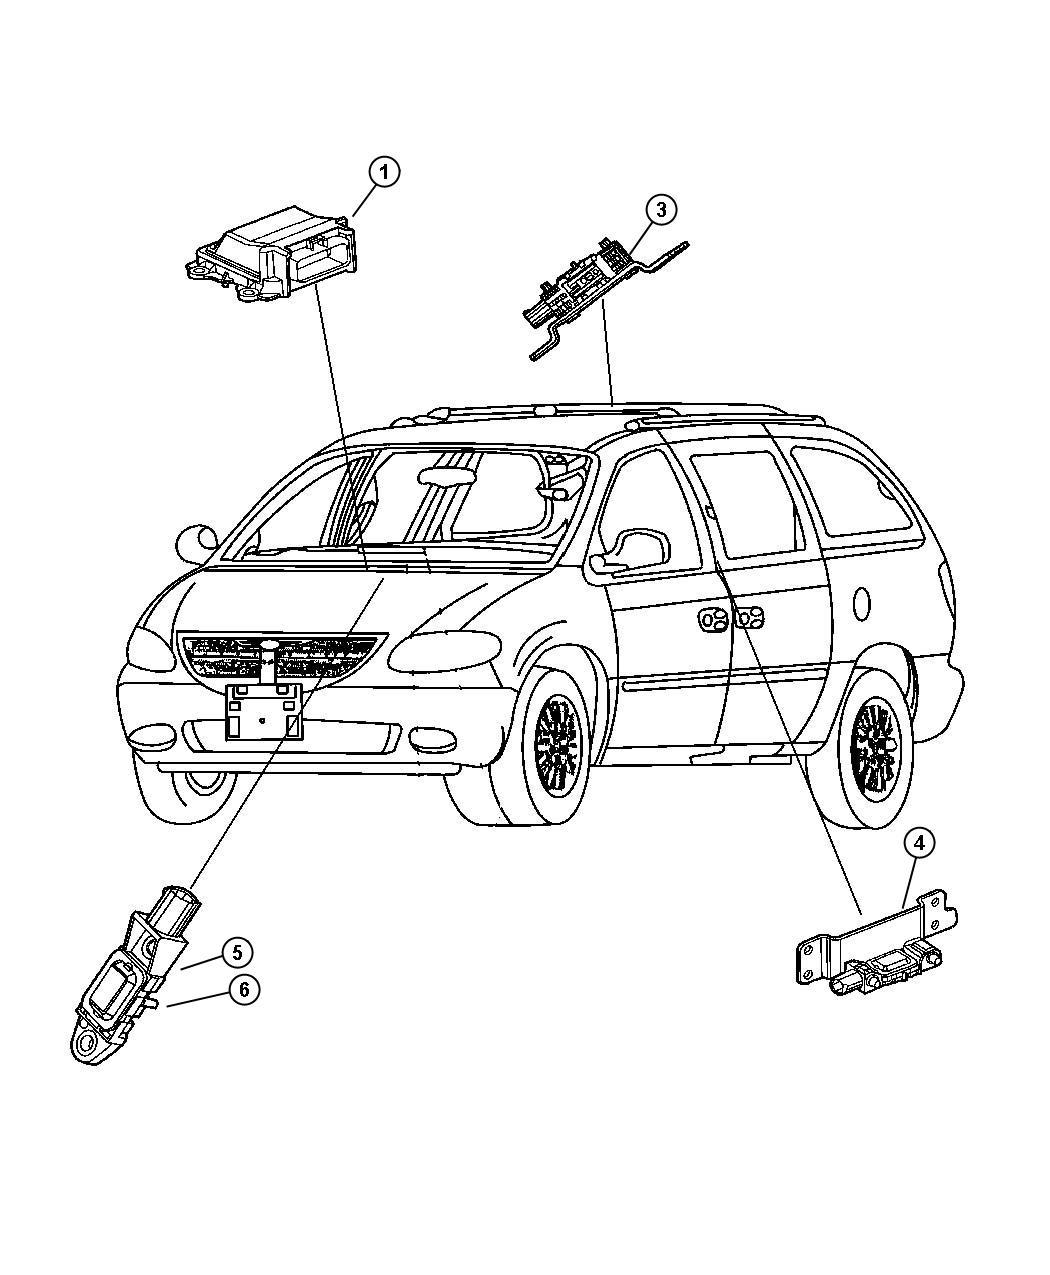 Dodge Grand Caravan Sensor Side Airbag Impact Right B Pillar Rows Curtain Bags